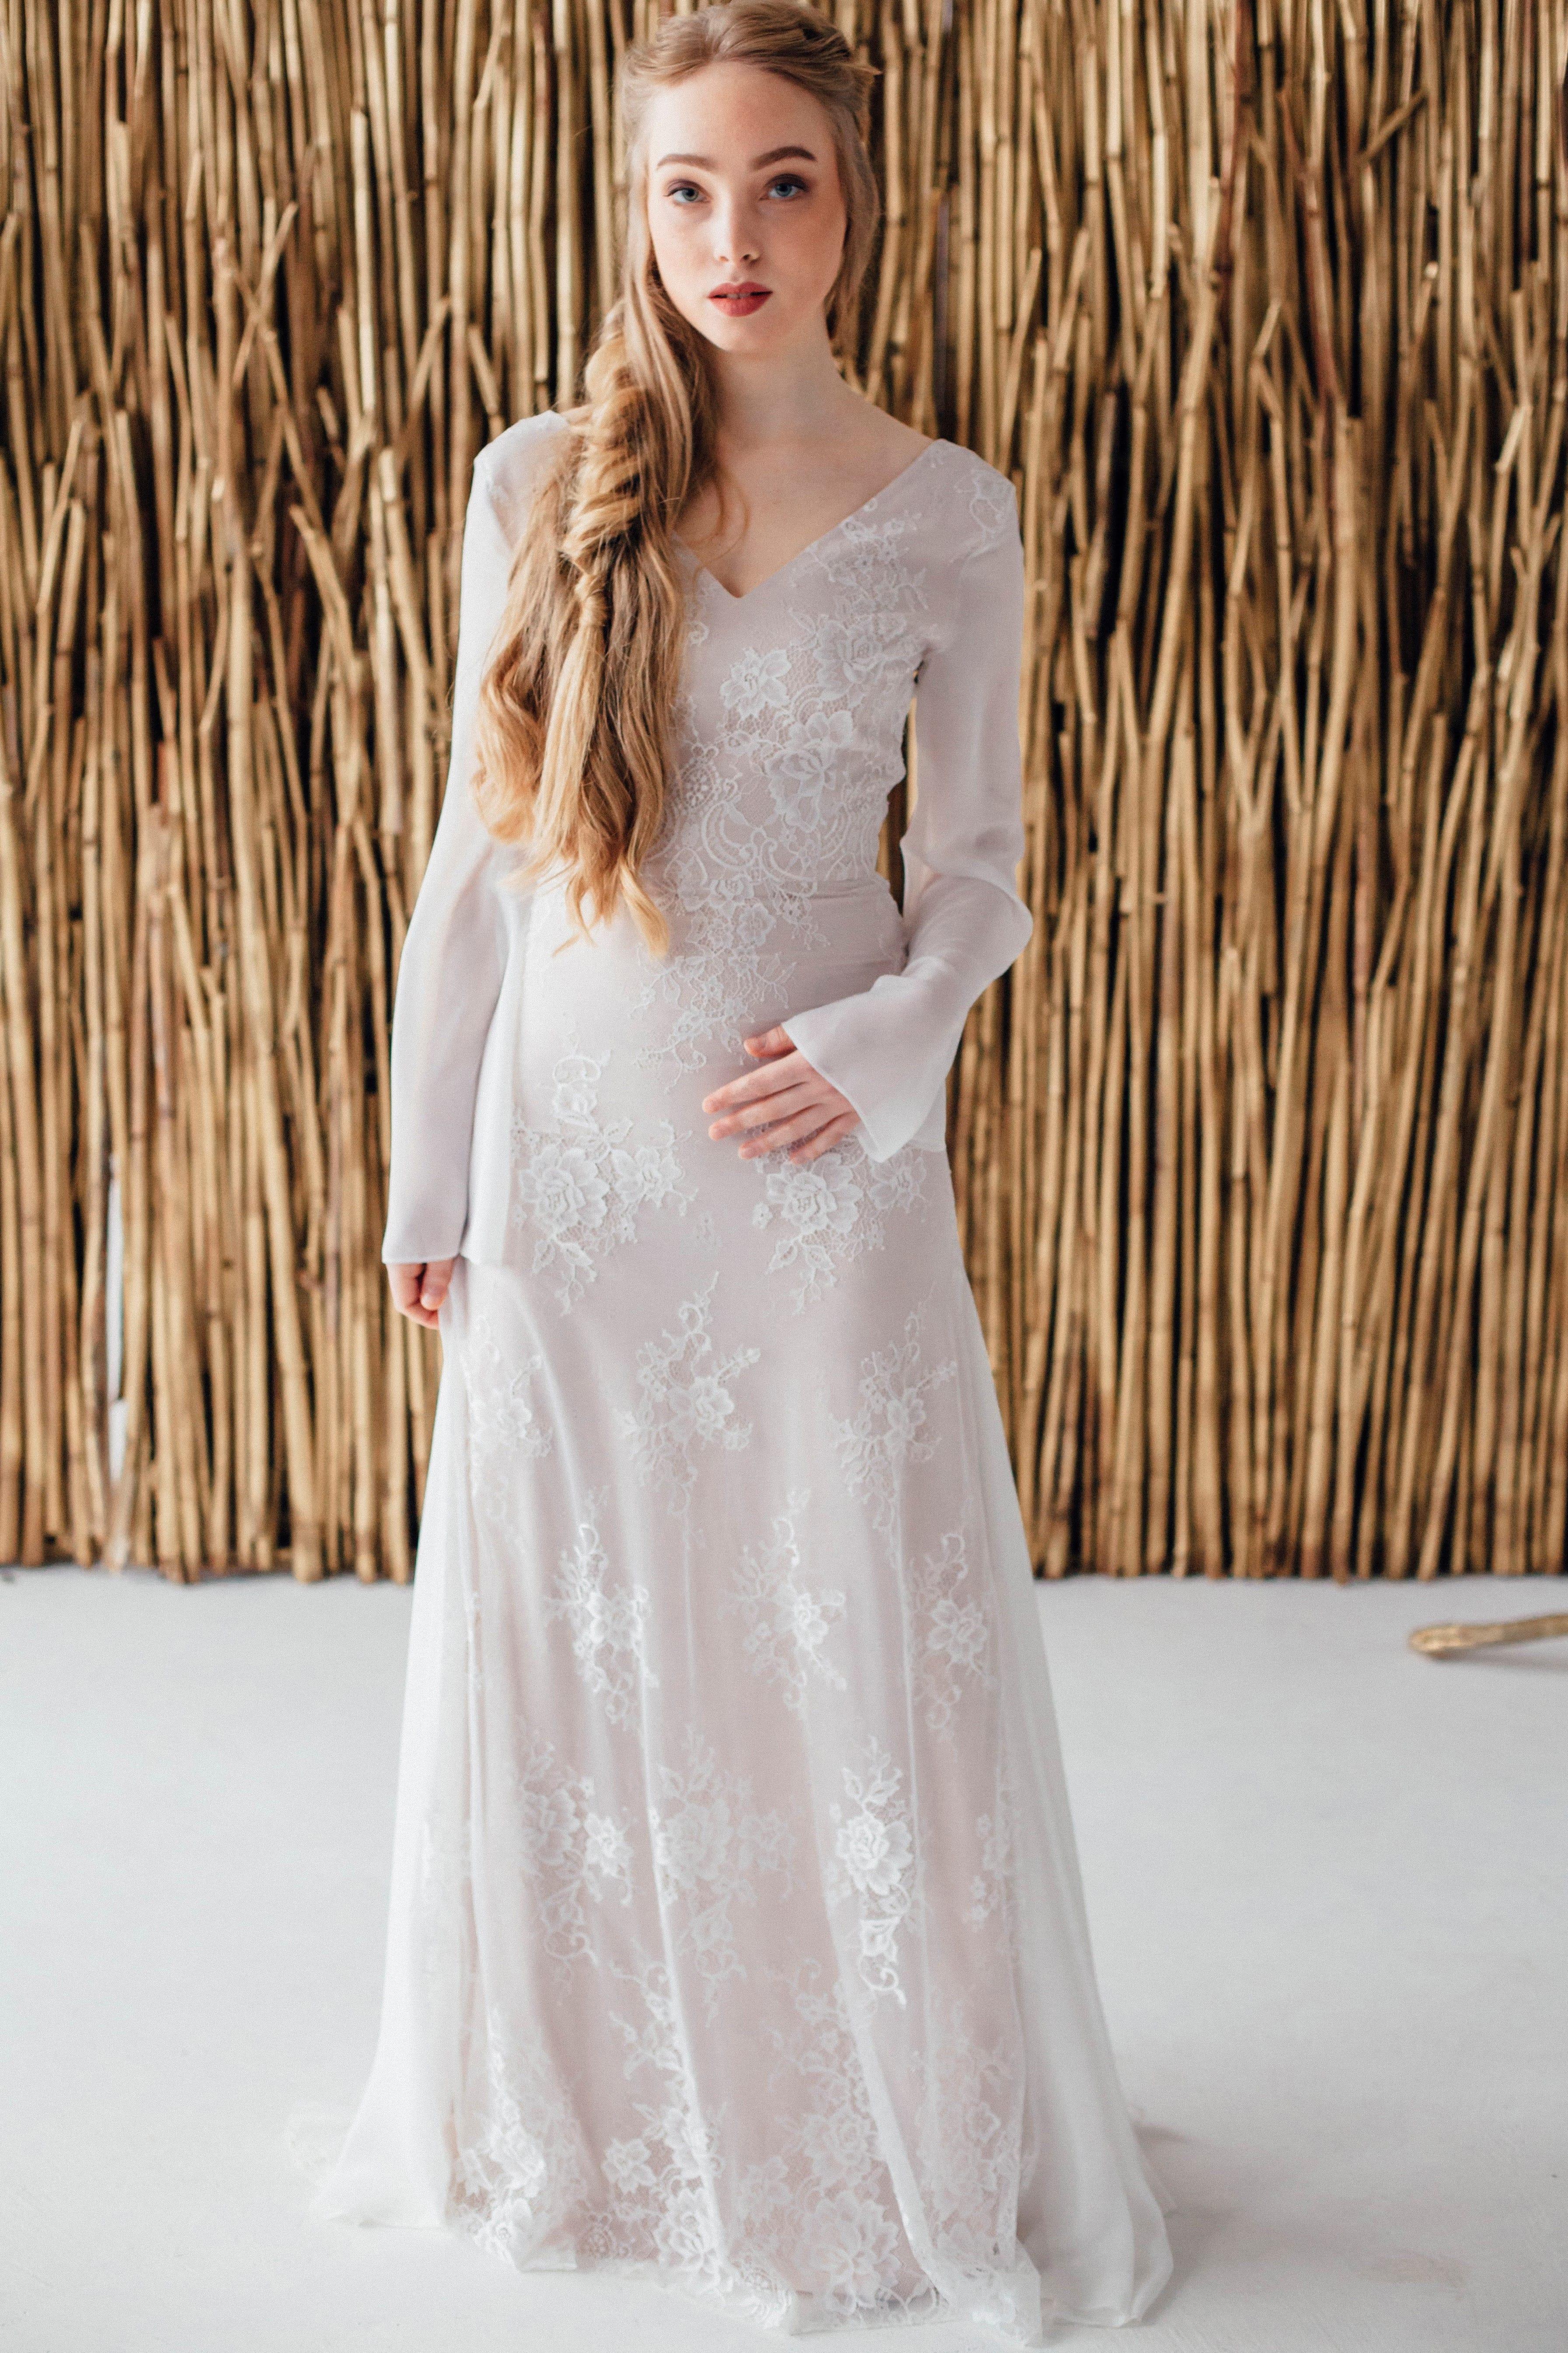 Свадебное платье AELITA, коллекция MAGIC OF TENDERNESS, бренд LORA SONG, фото 1